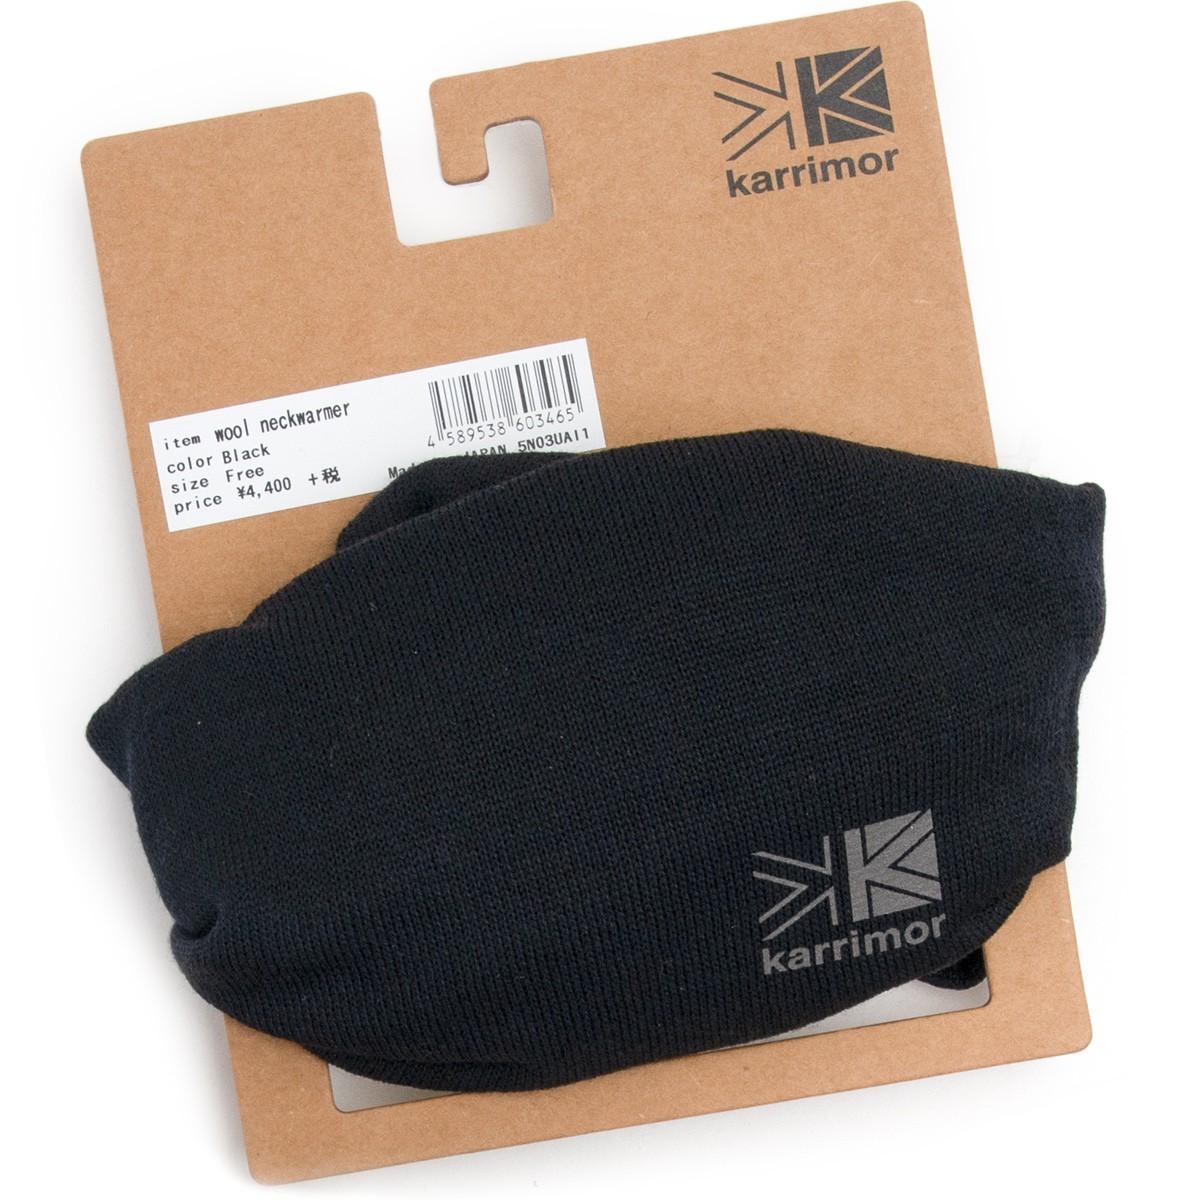 karrimor wool neckwarmer